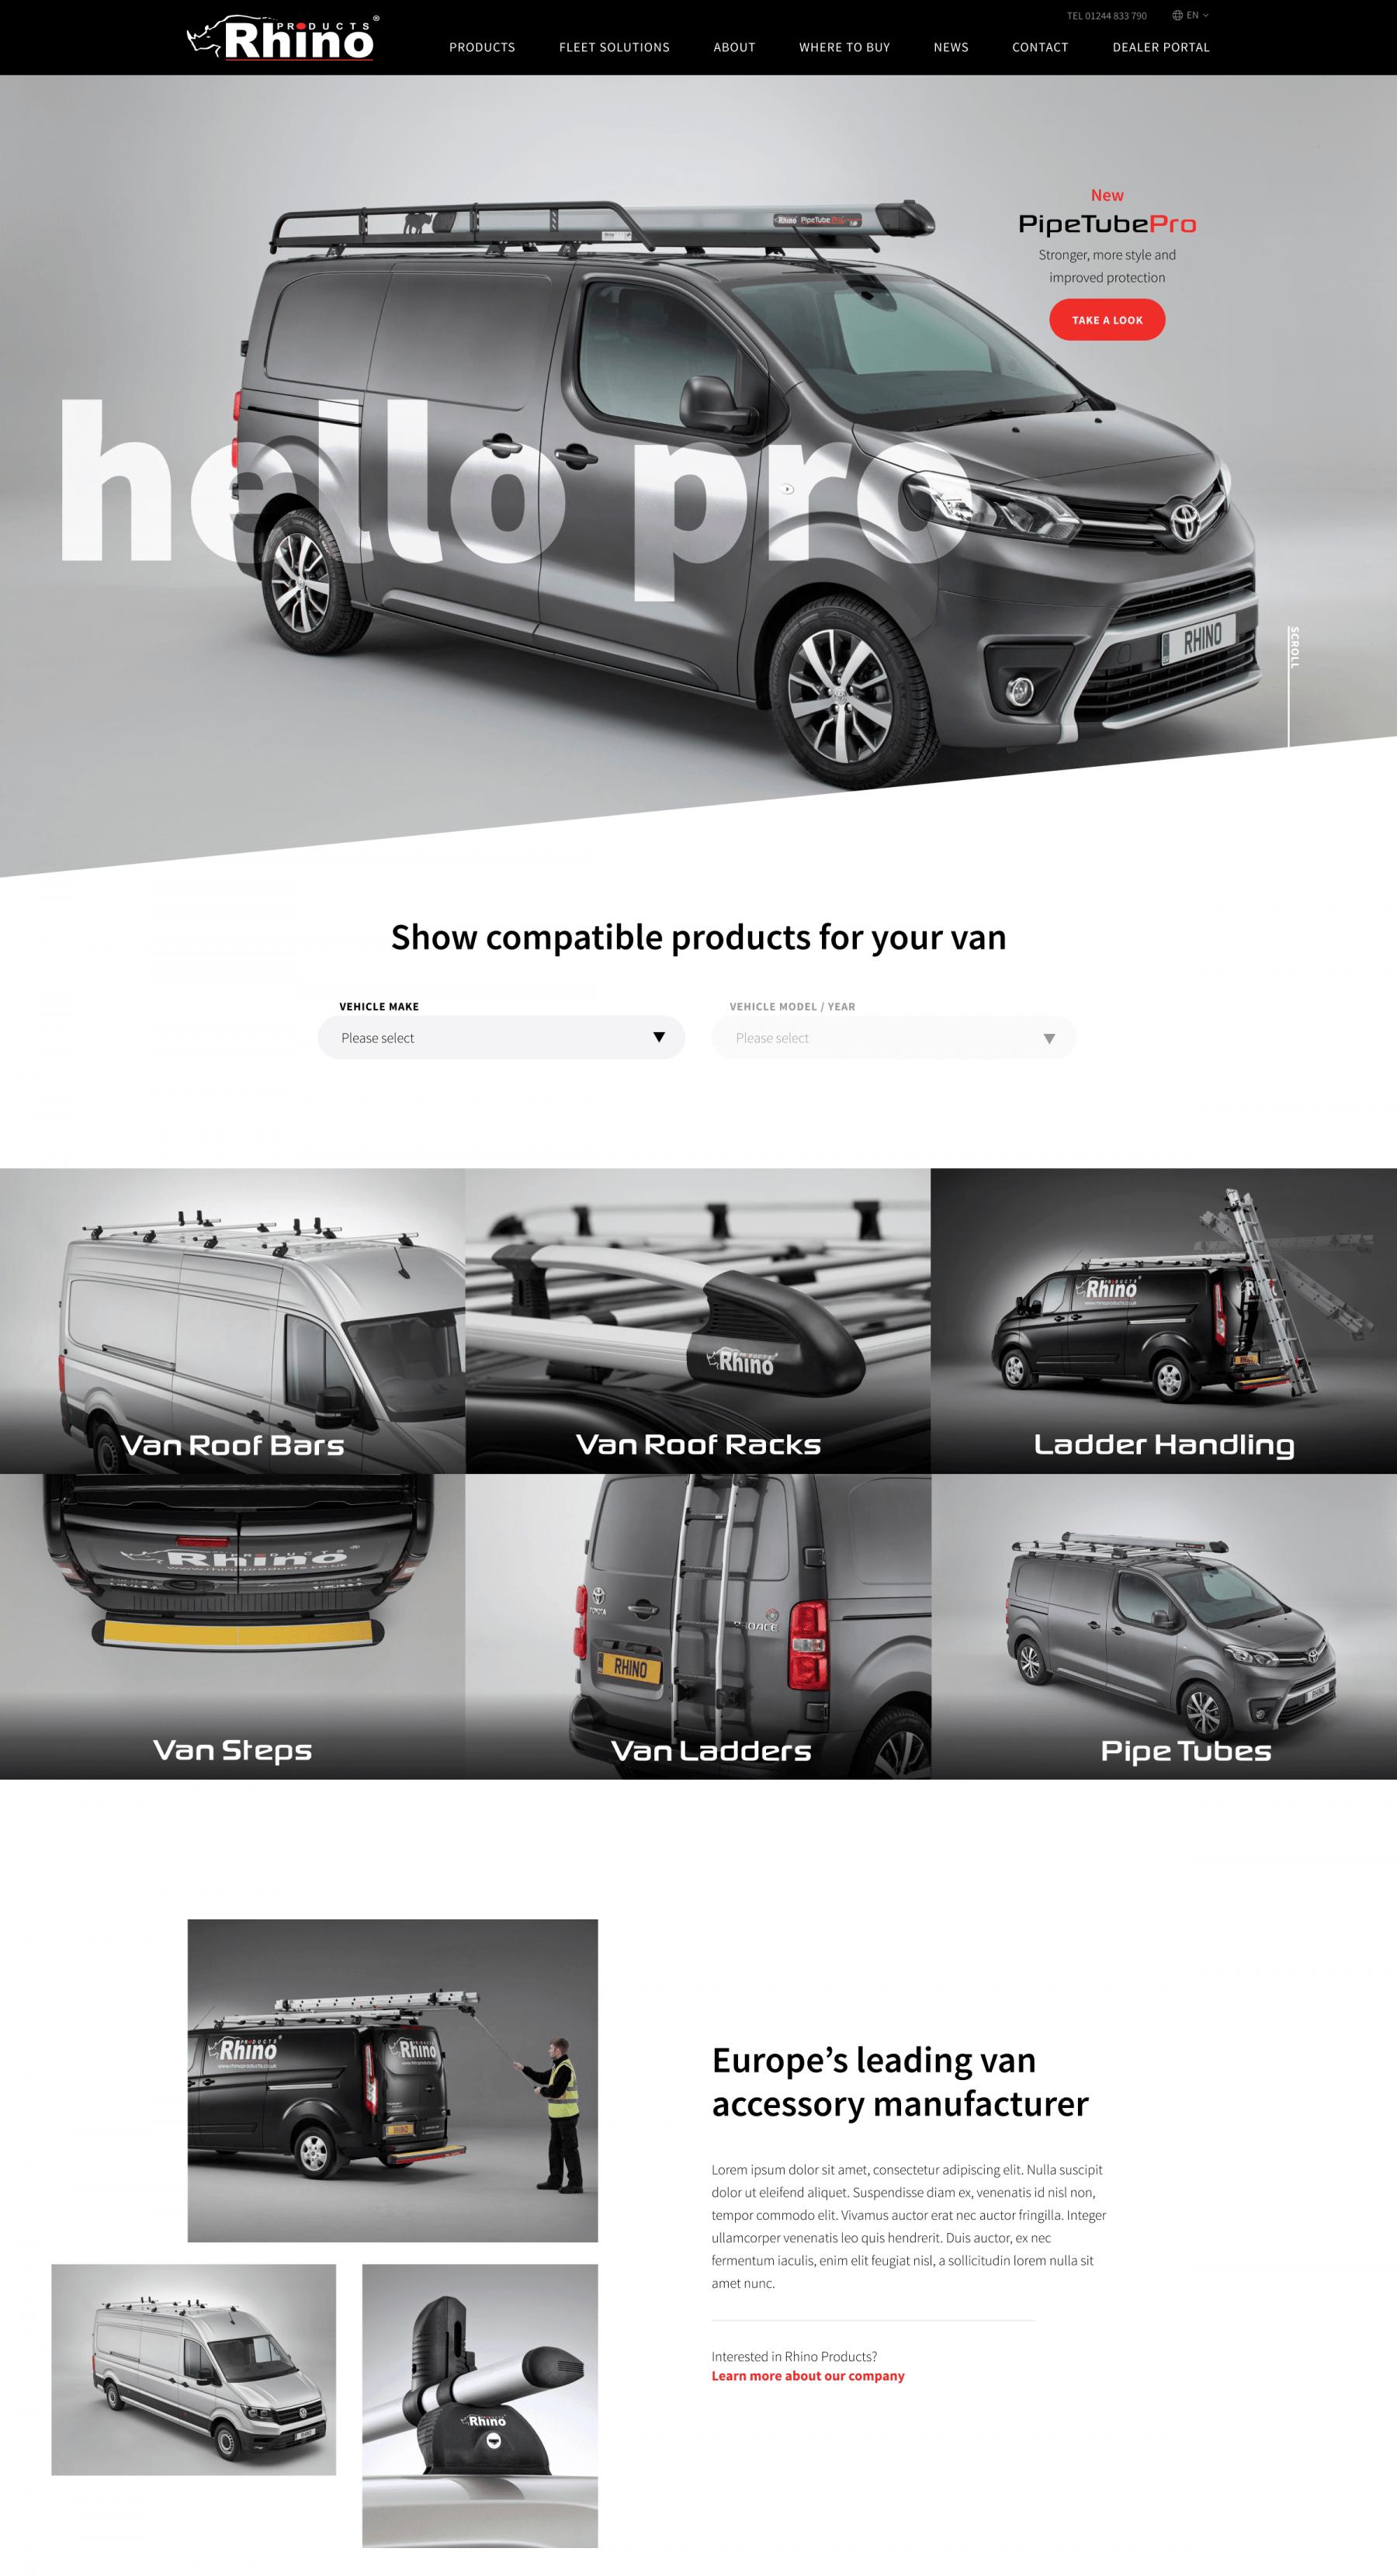 Rhino Products Homepage